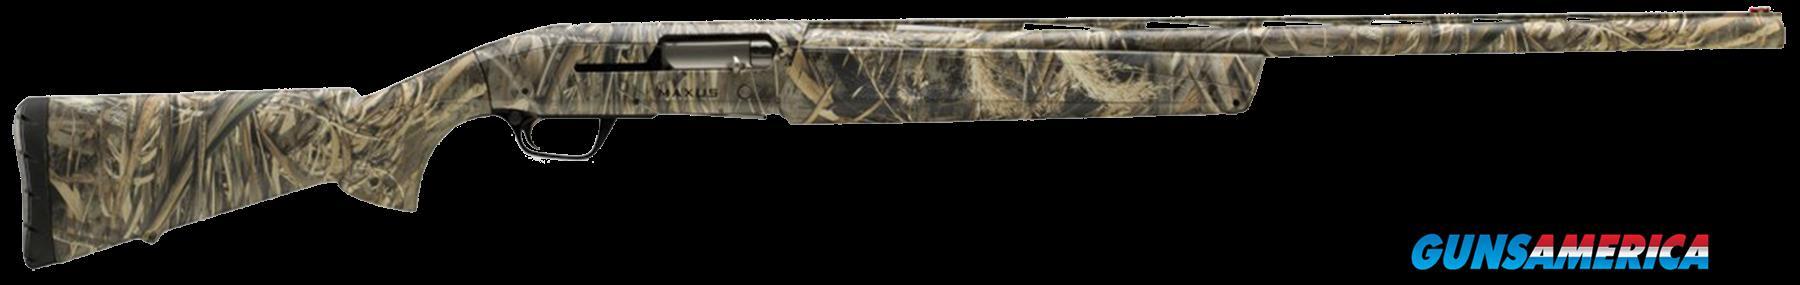 Browning Maxus, Brn 011-653204 Maxus         12 28 3.5    Max5  Guns > Pistols > 1911 Pistol Copies (non-Colt)